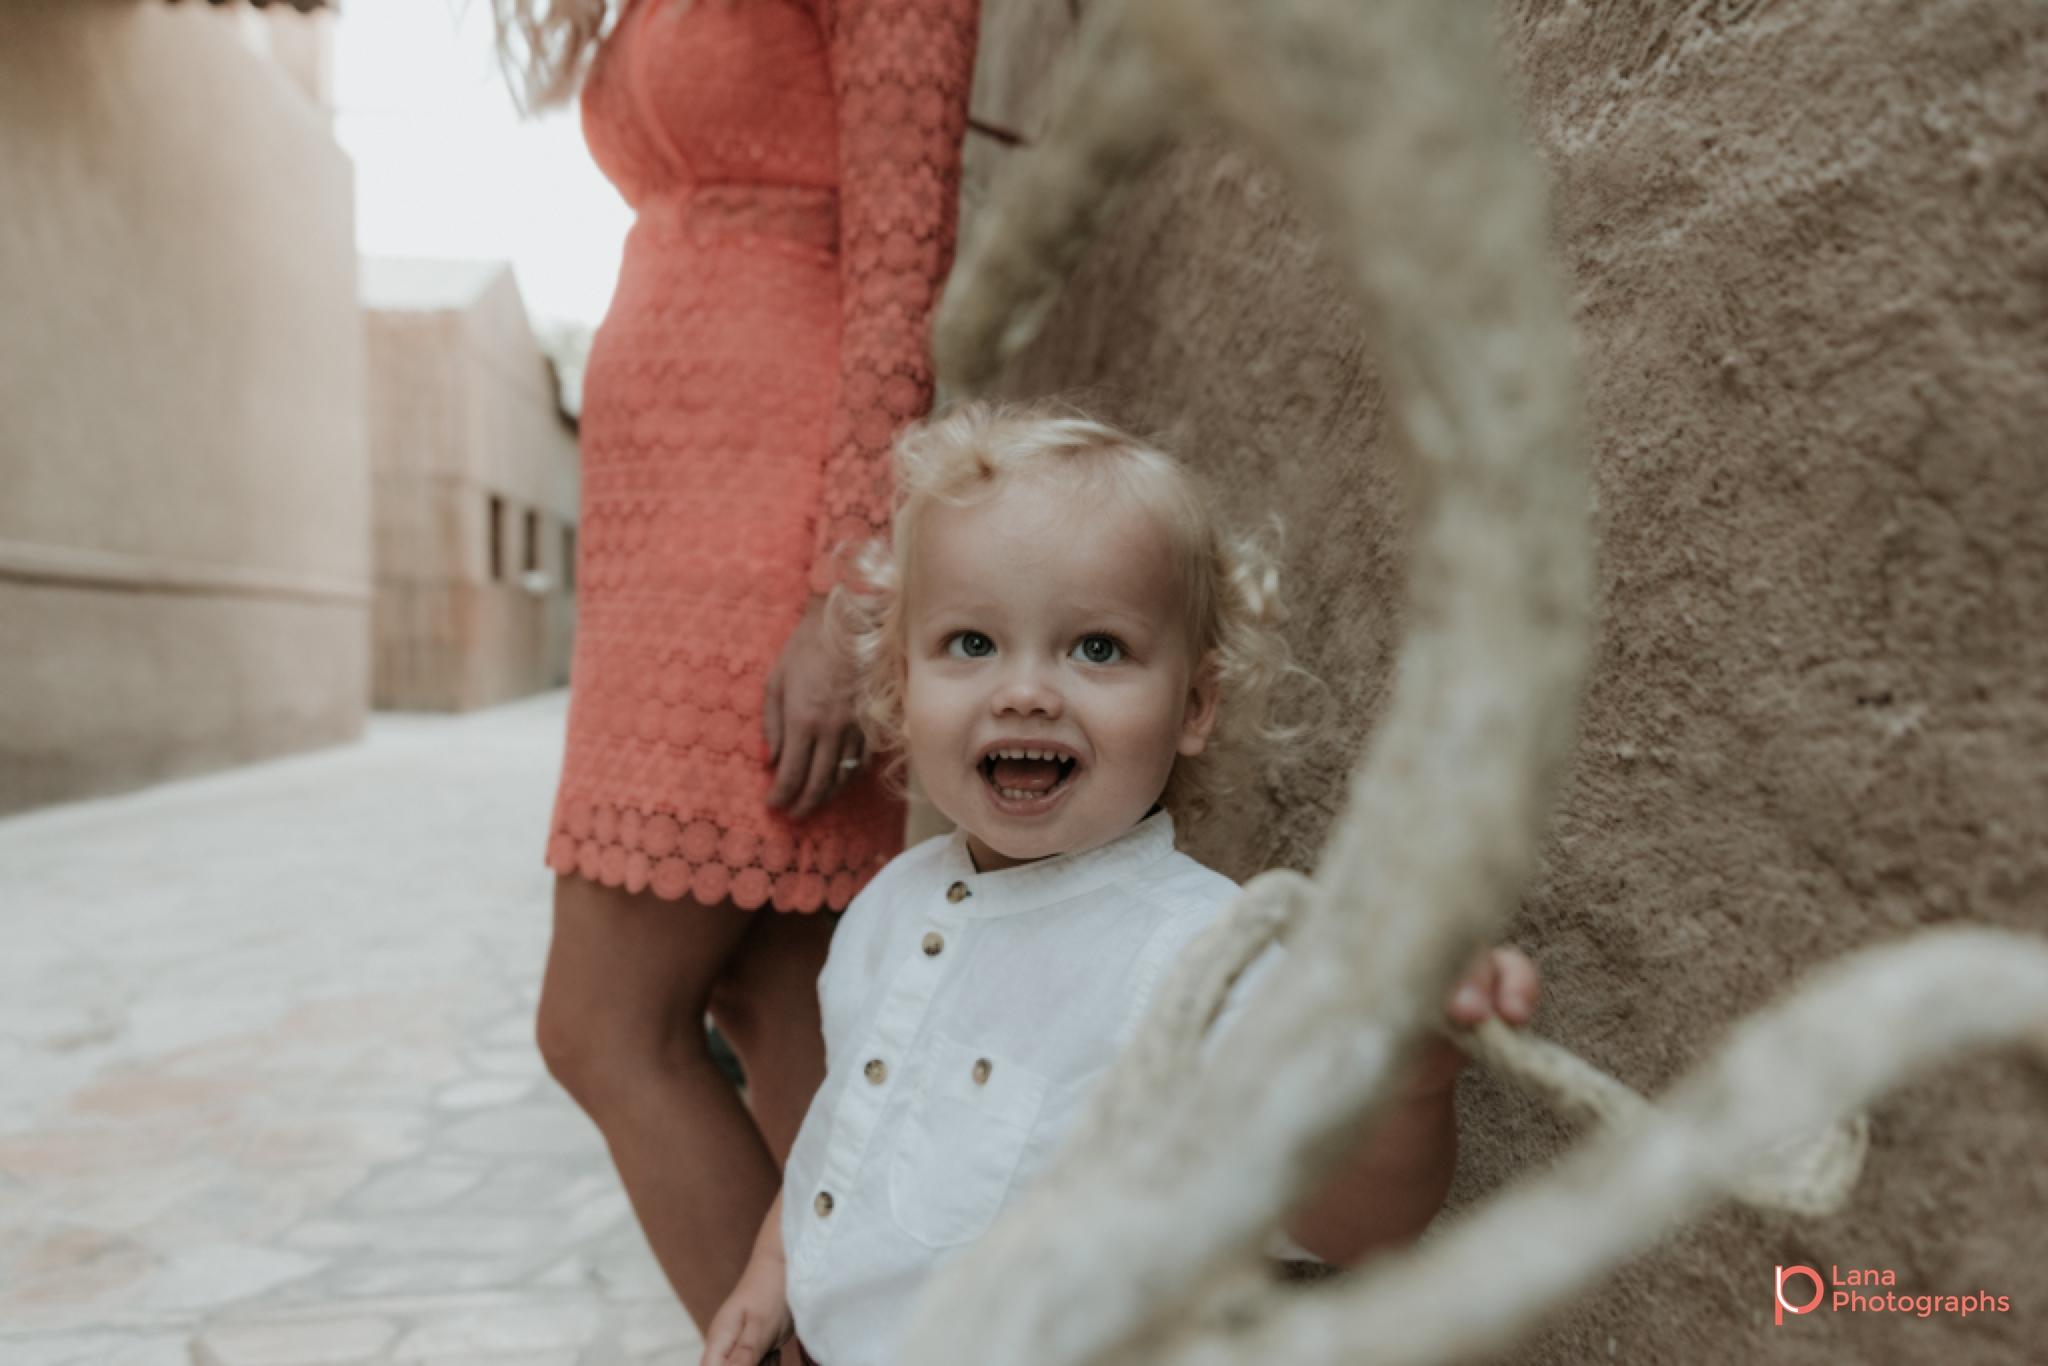 Lana-Photographs-Dubai-Family-Photography-Kirsty-PSLR-11.jpg